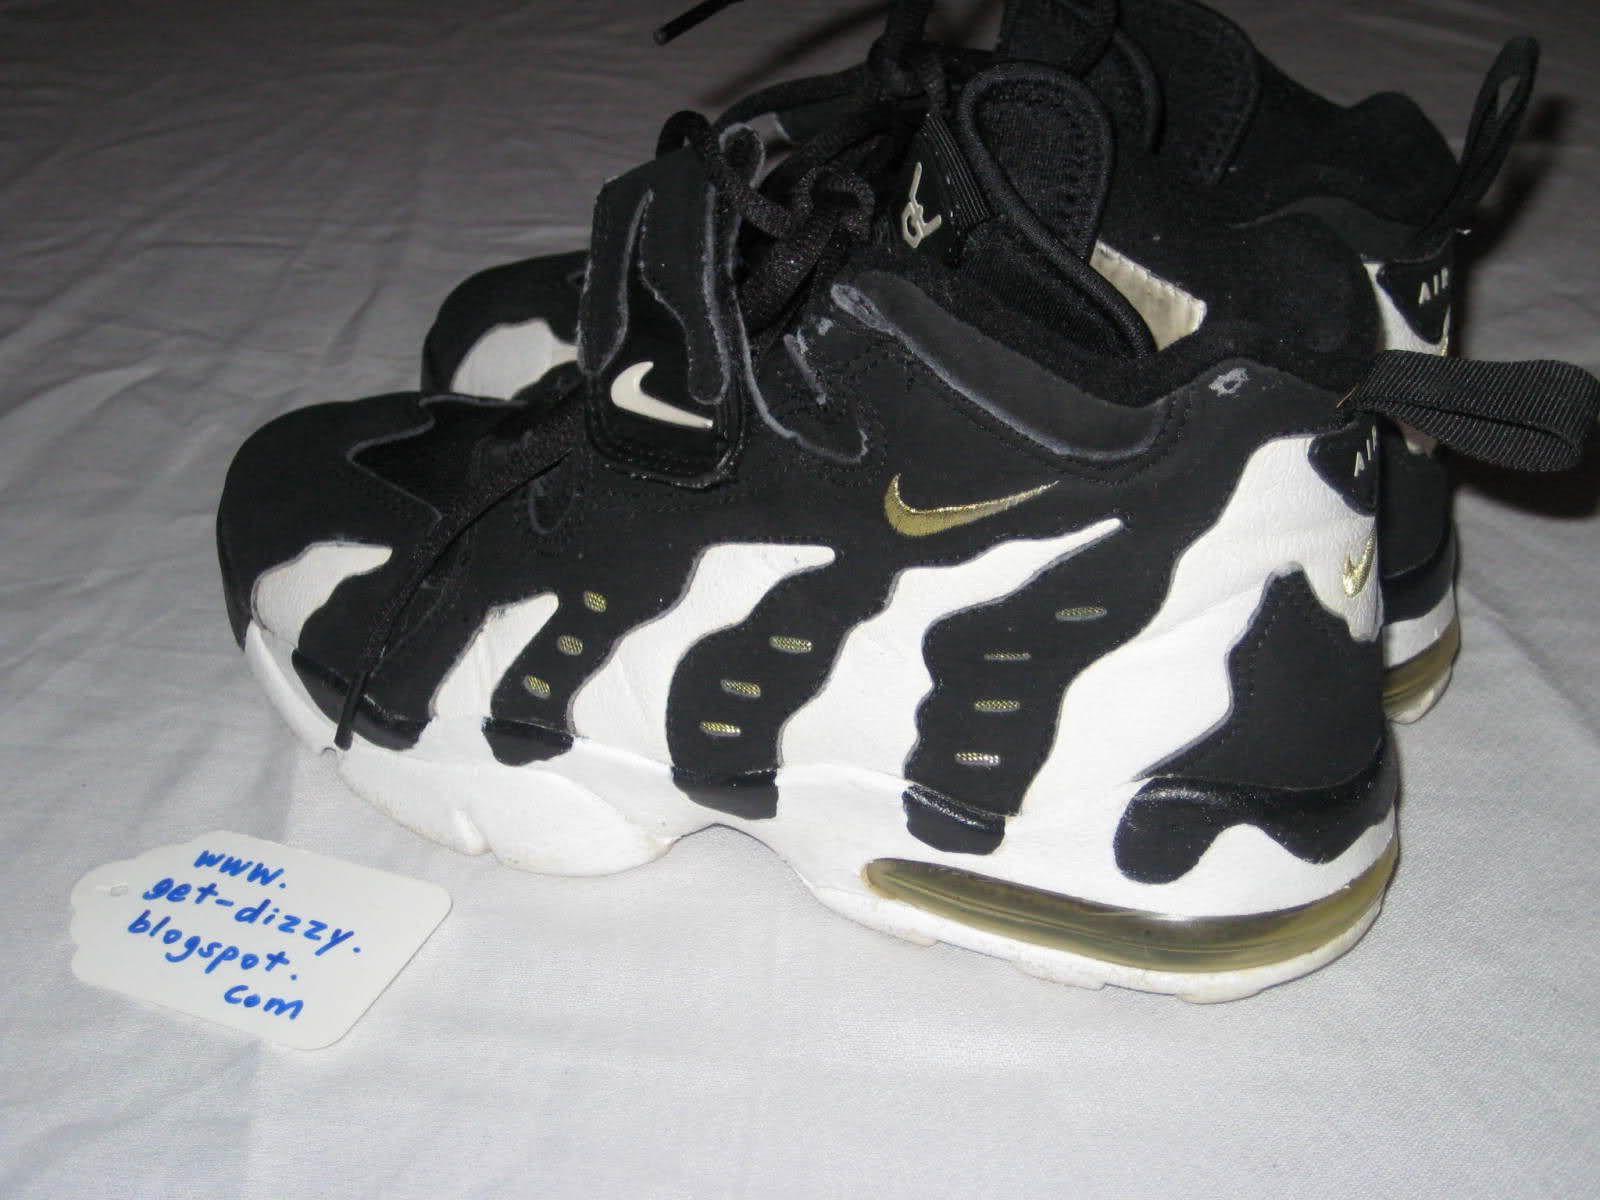 4ed45c6518 96 Nike Diamond Turf. The Deion Sanders'. Prime Time. | Wes' Shoe ...